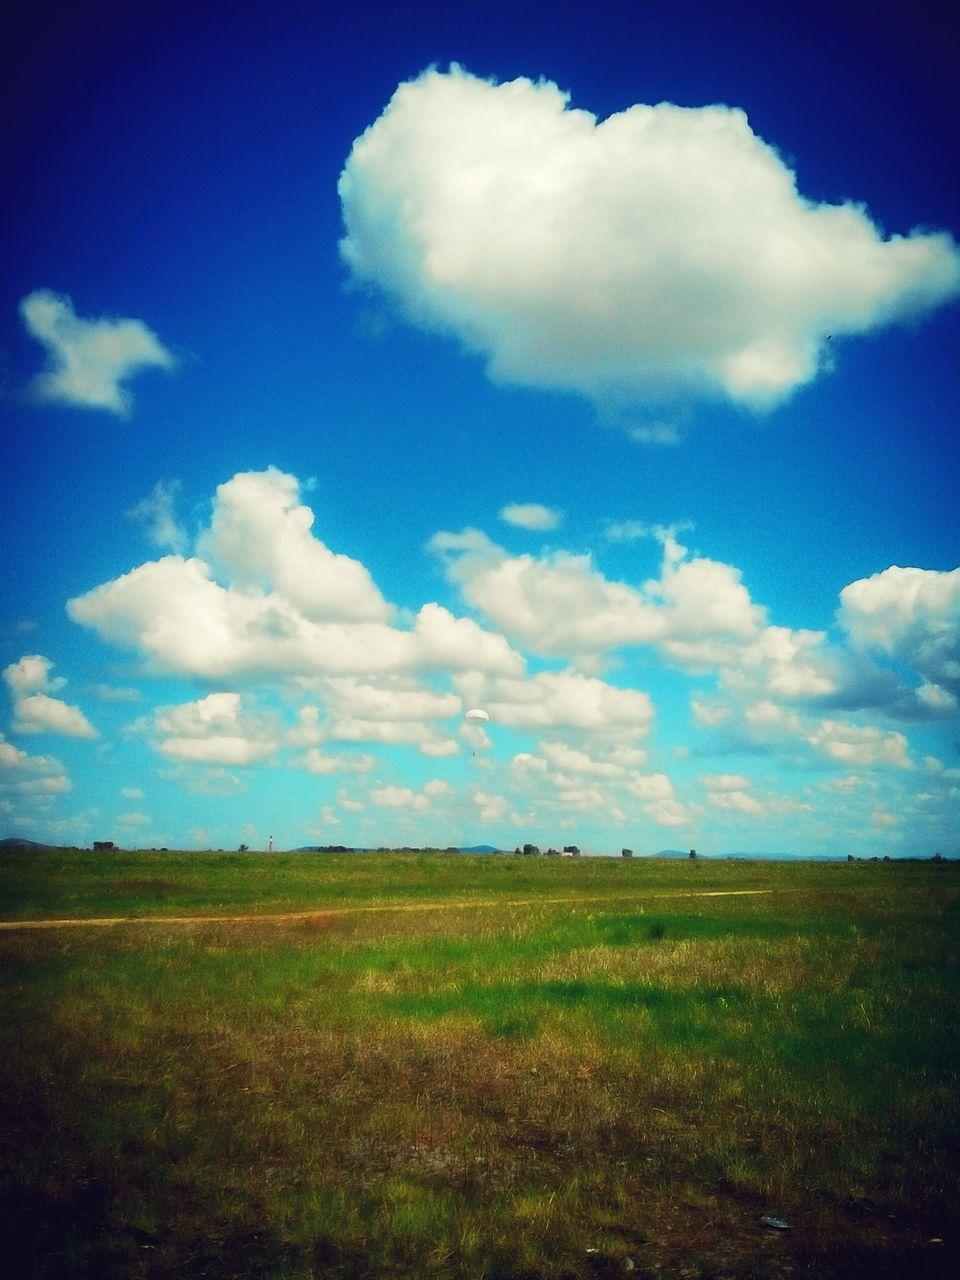 landscape, freedom, field, nature, blue sky, sky, grass, no people